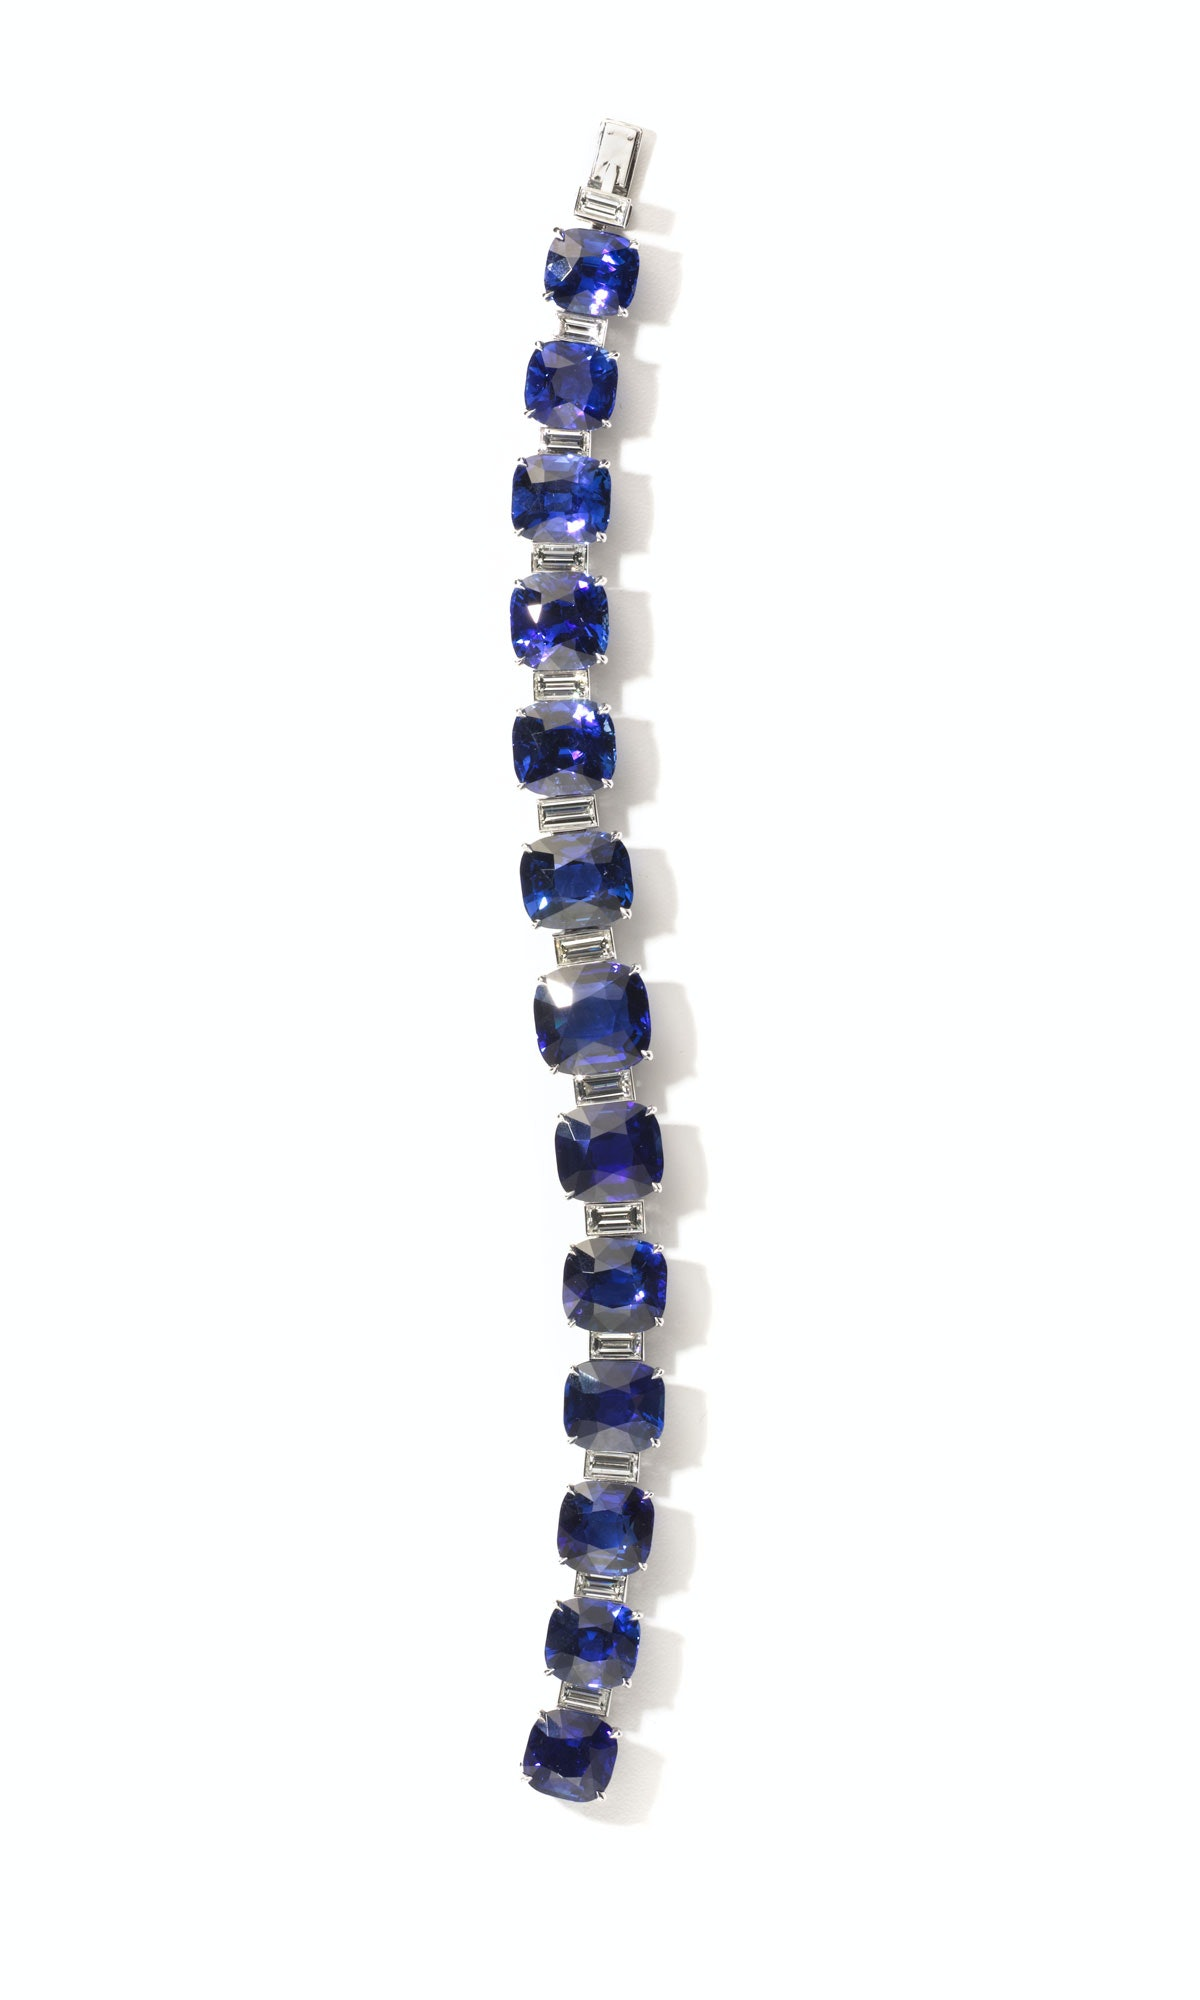 1213-W-TH-HarryWinston_Luxe-2Harry Winston platinum, sapphire, and diamond bracelet, price upon requ...